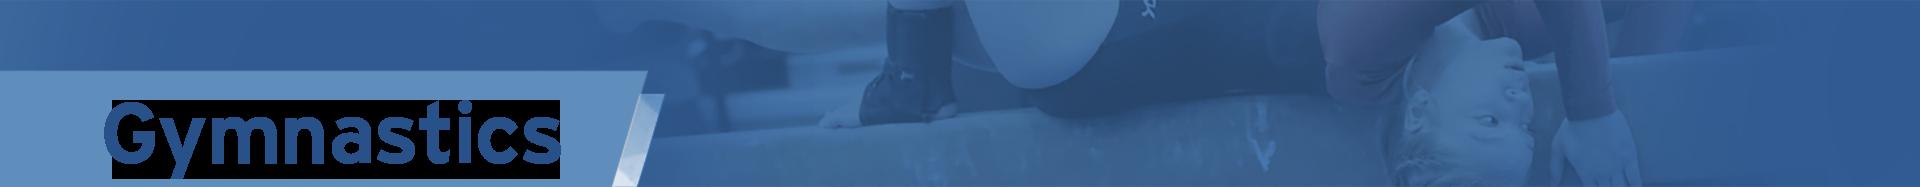 SDPB HS Gymnastics Logo